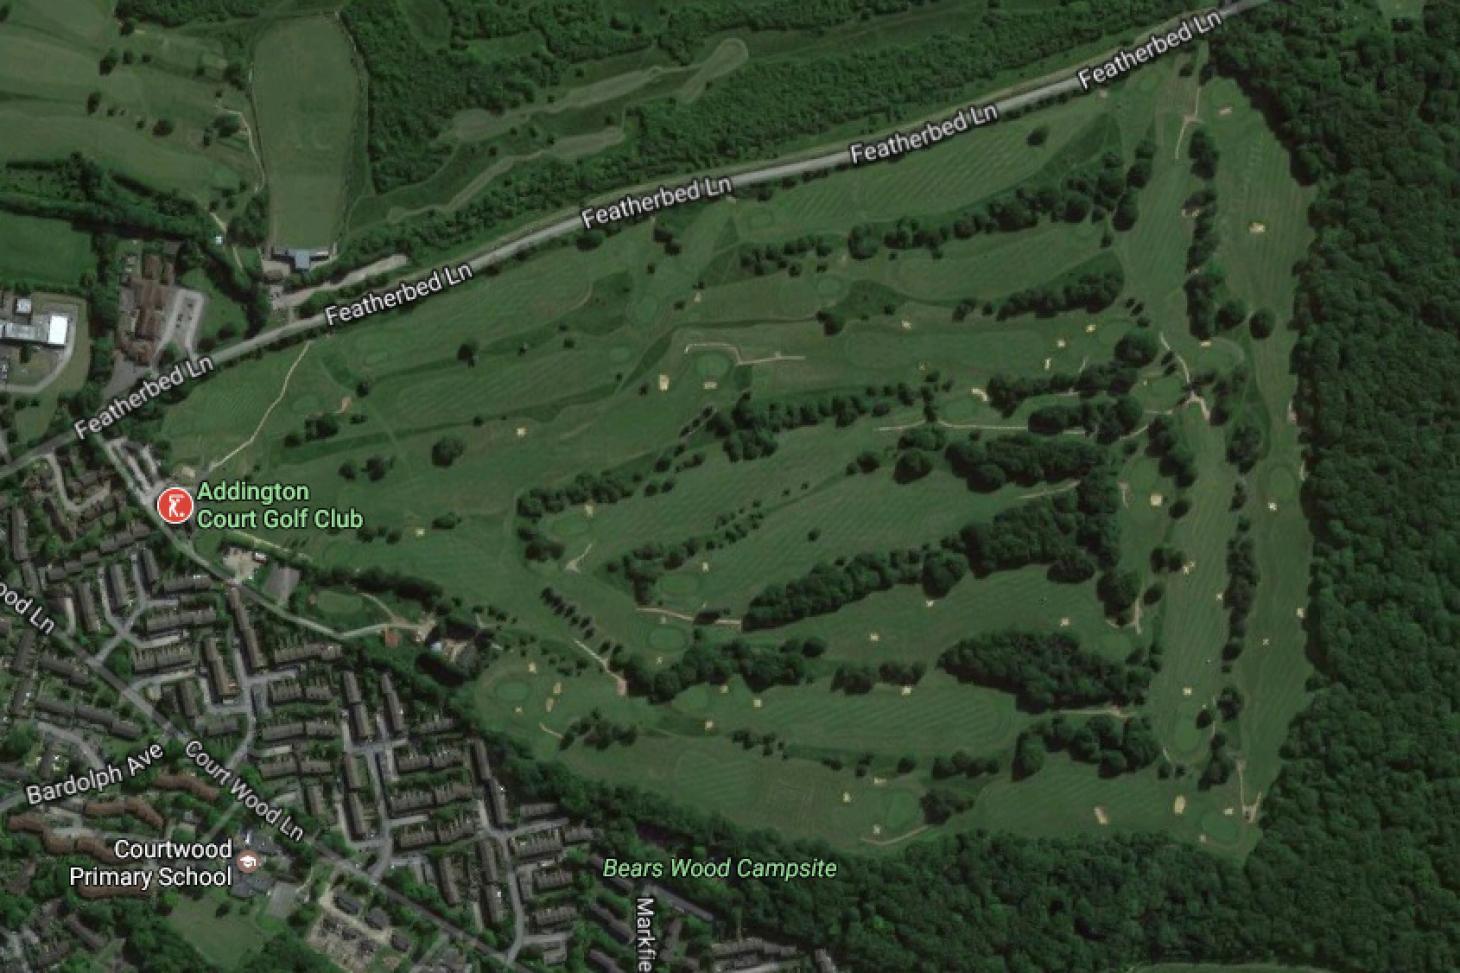 Addington Court Golf Centre 18 hole golf course